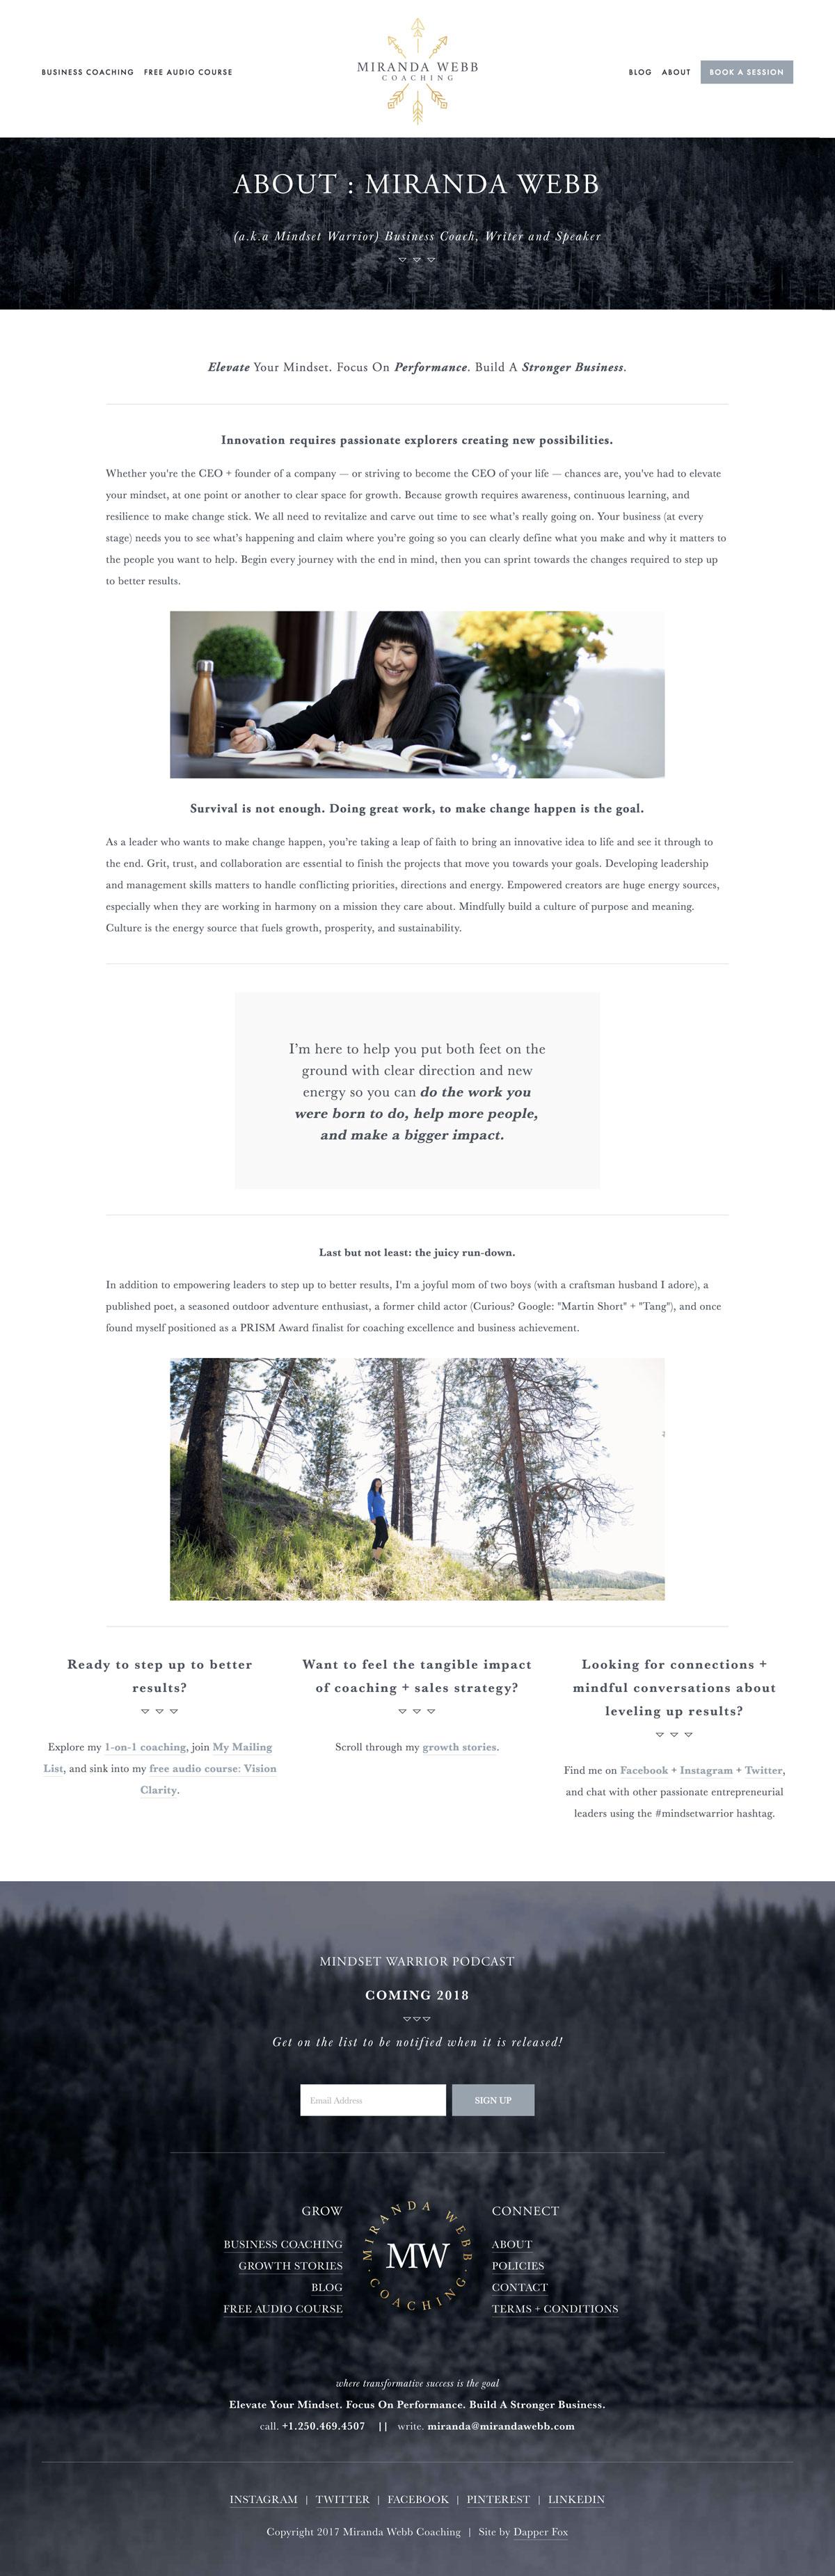 About Miranda, Business Warrior and Mindset Coach Website Design